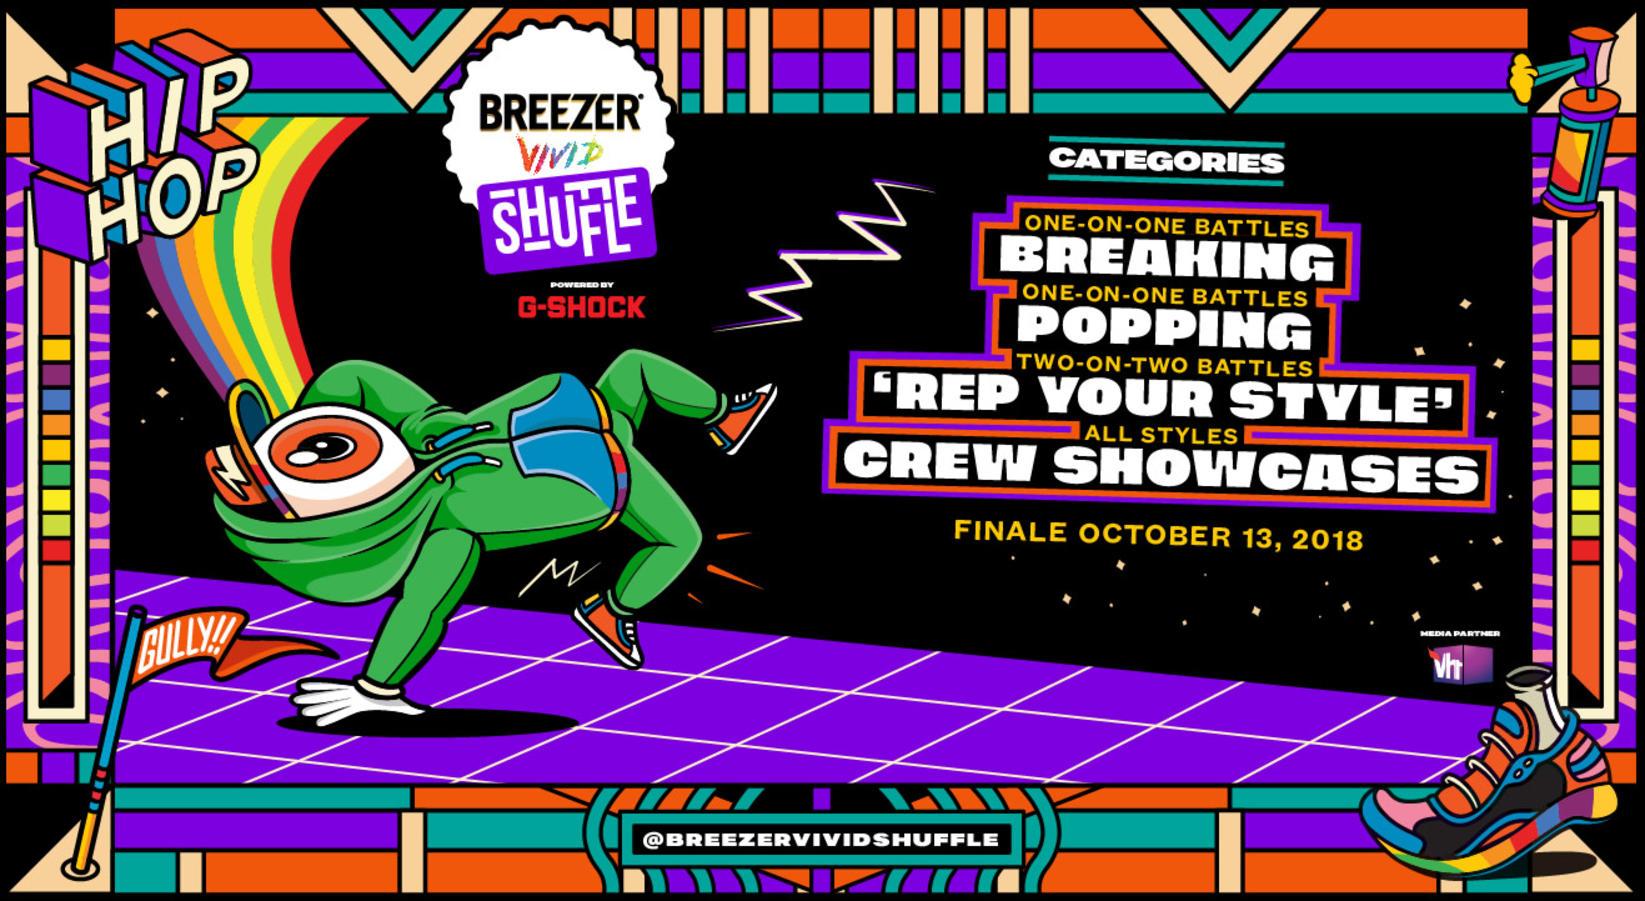 Breezer Vivid Shuffle 2018: India's Biggest Hip-Hop Dance Festival is Back!